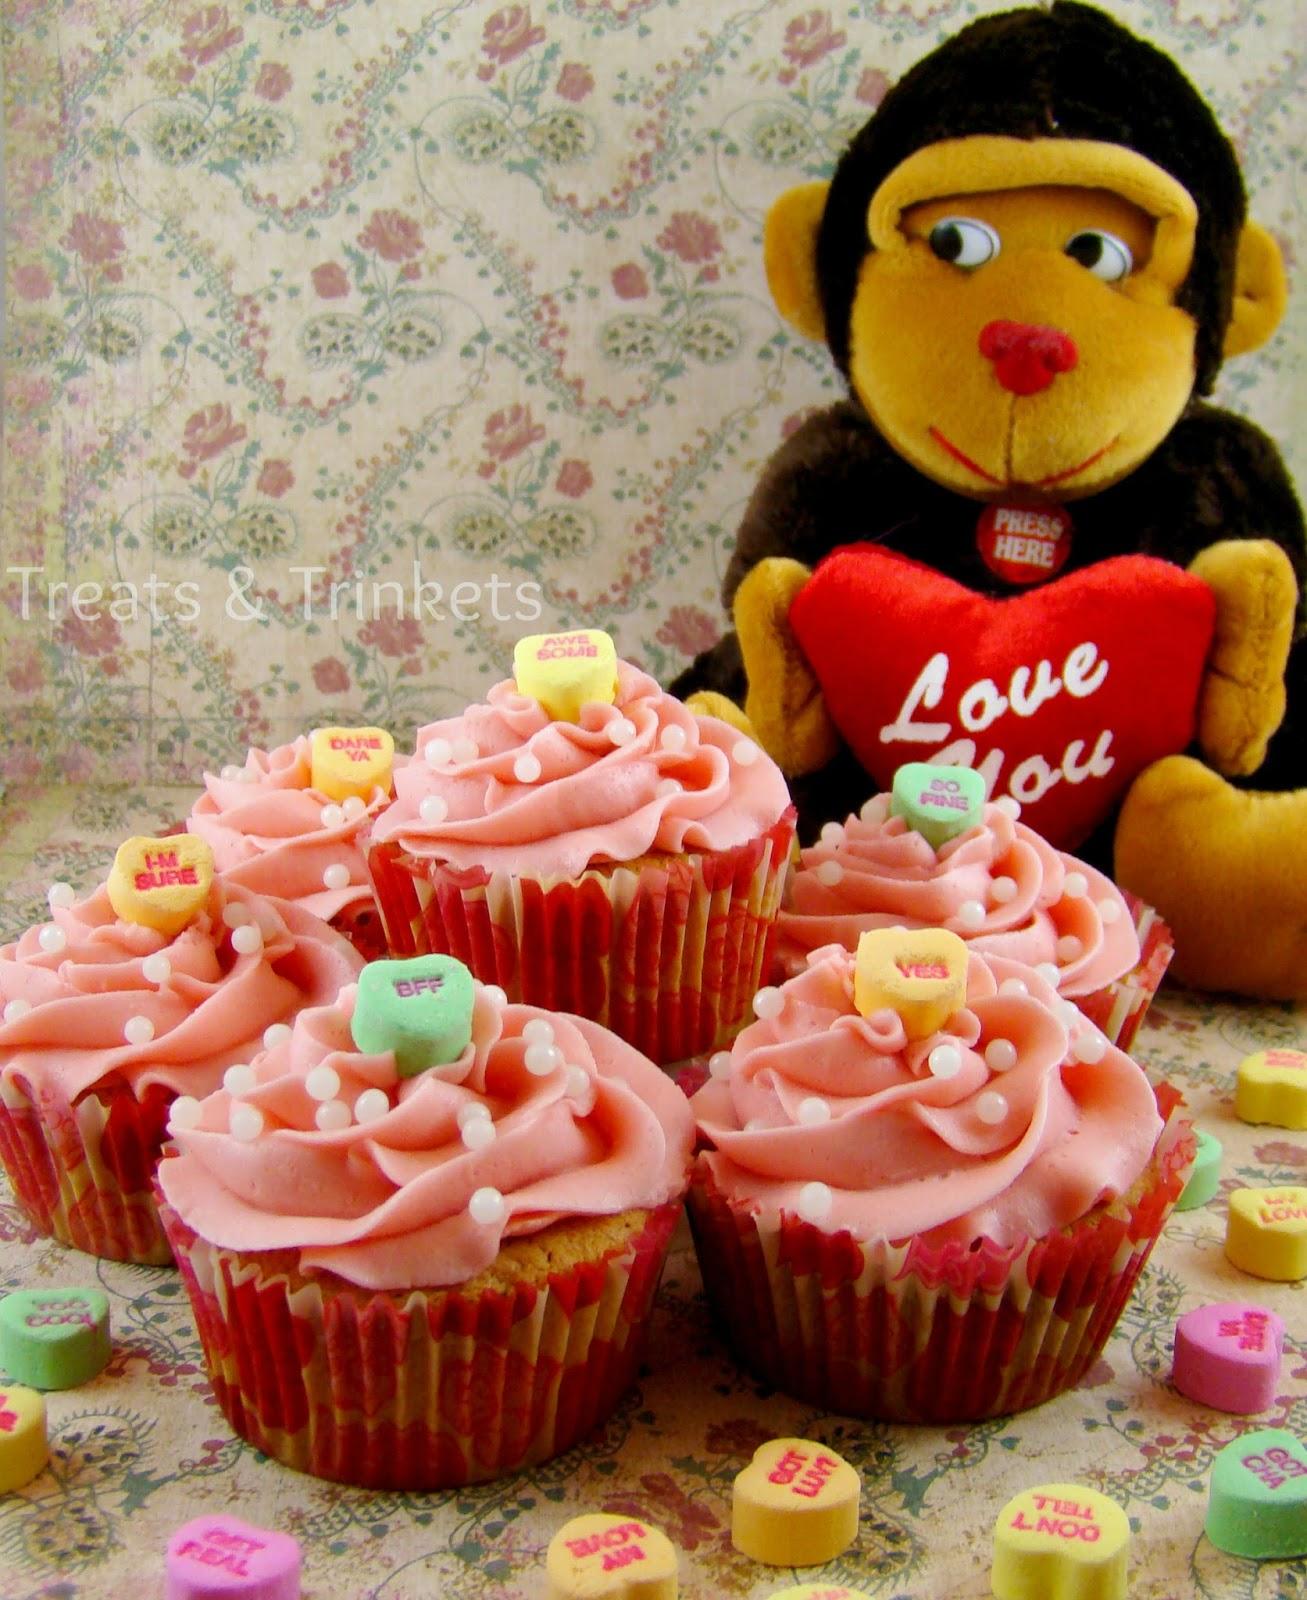 Strawberry Cupcakes Using White Cake Mix